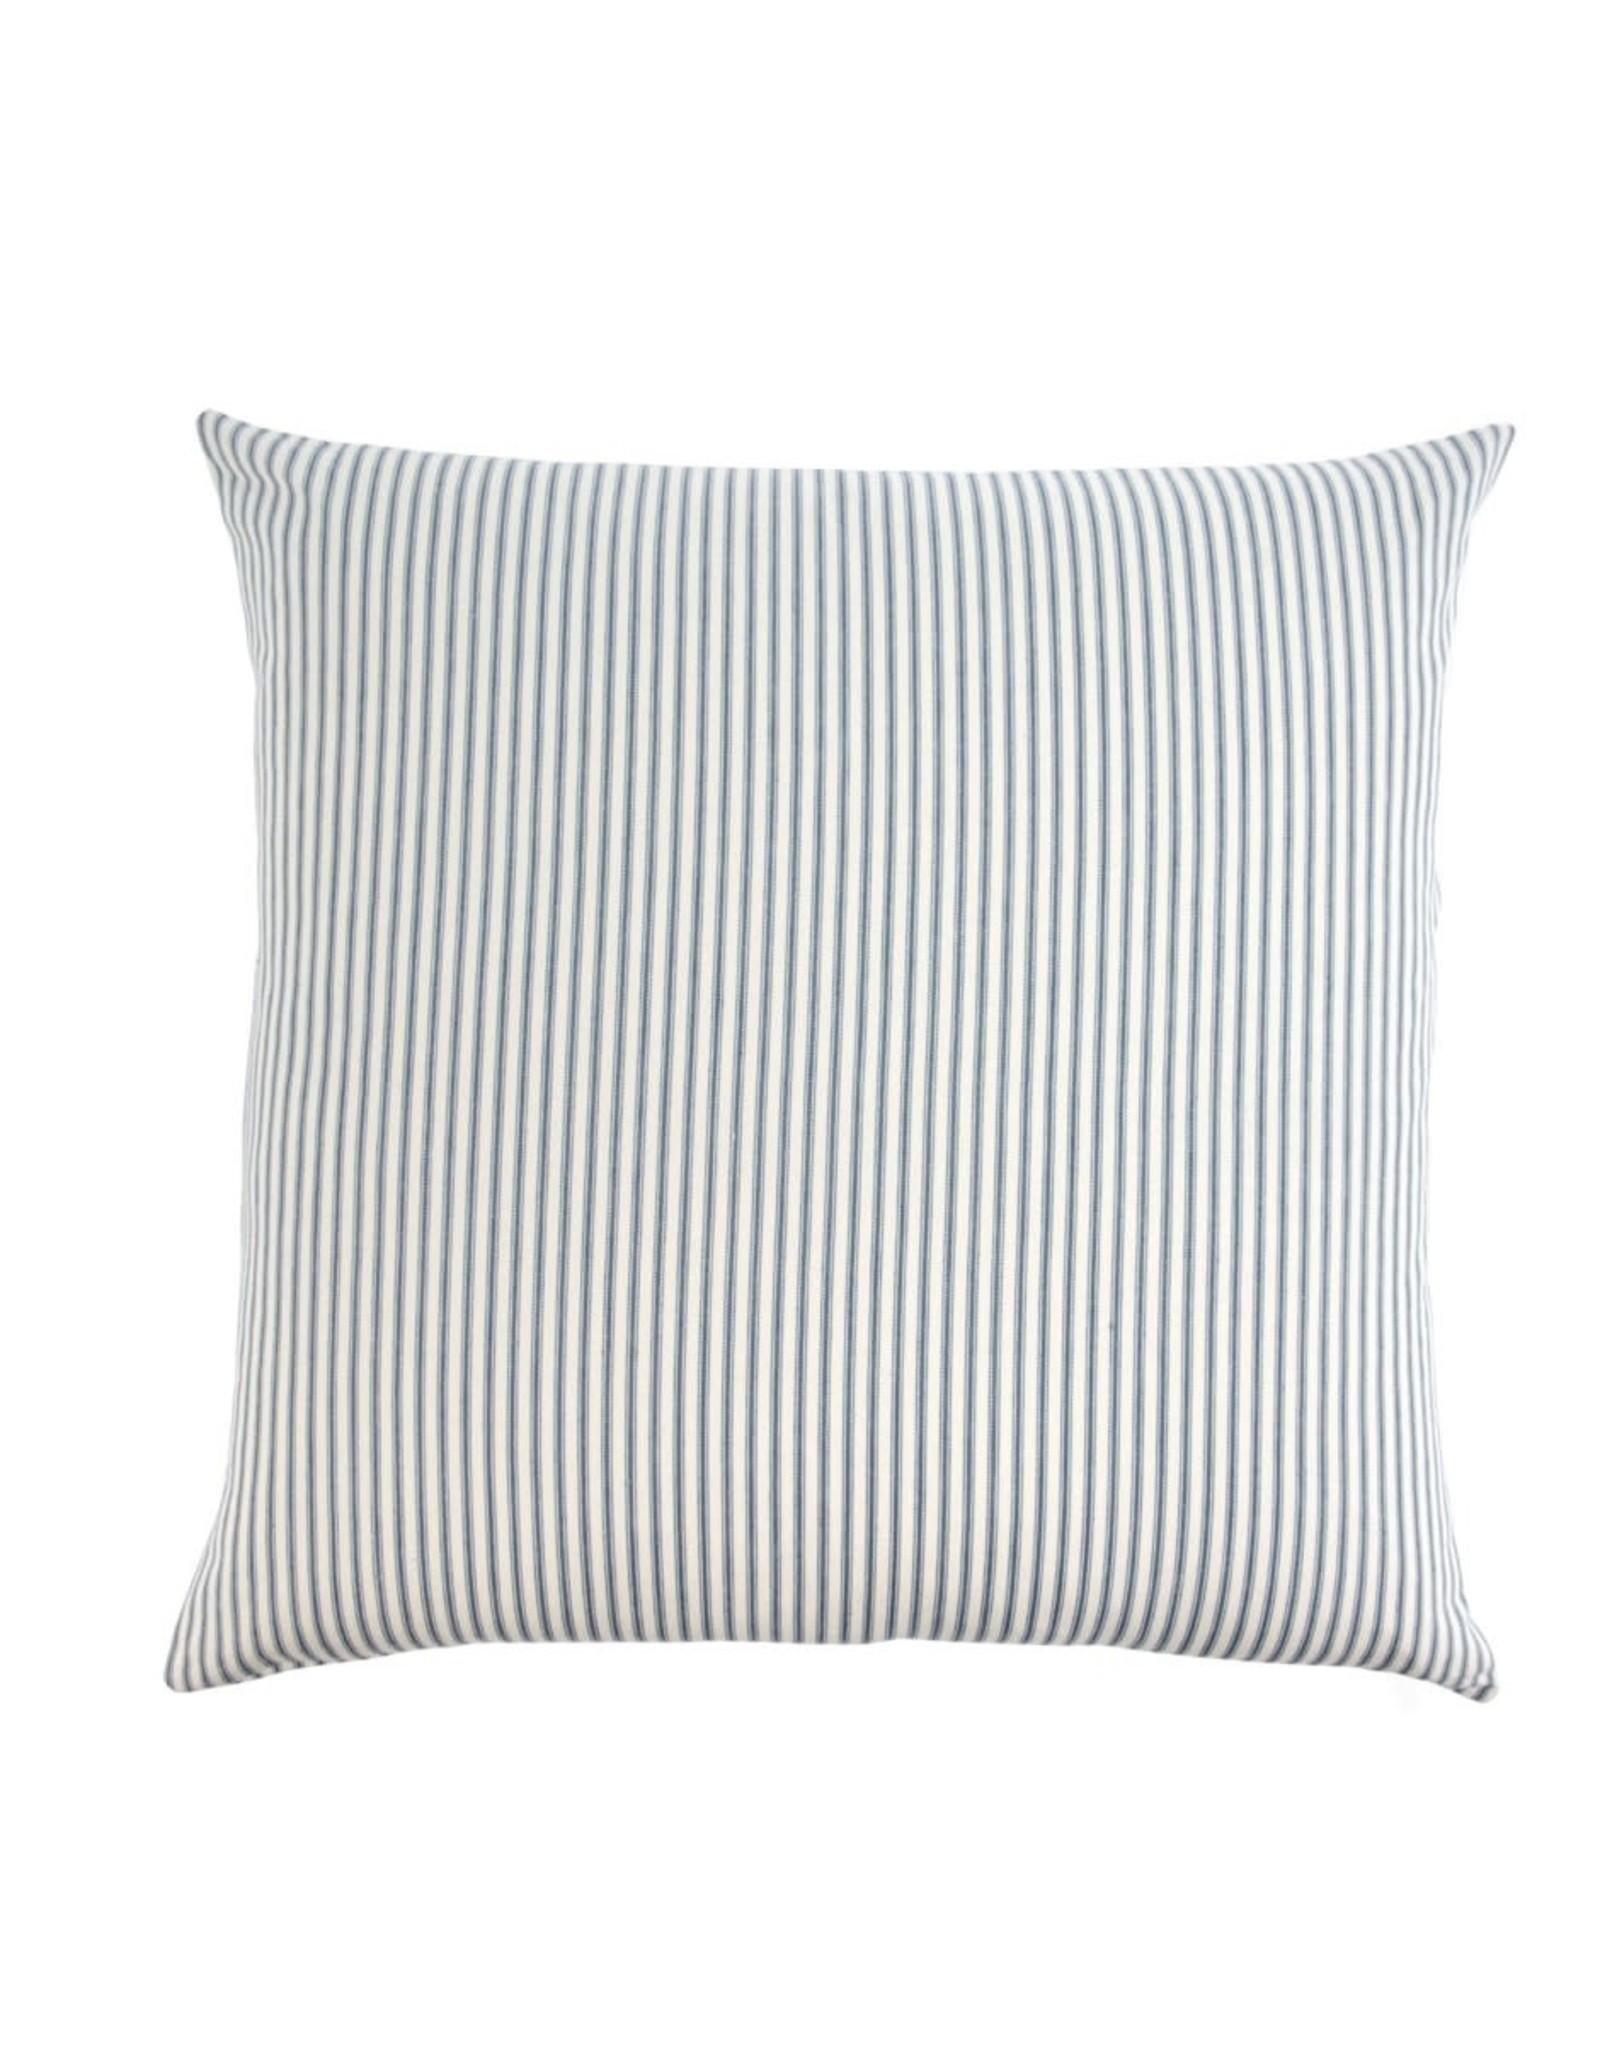 Cotton Ticking Pillow